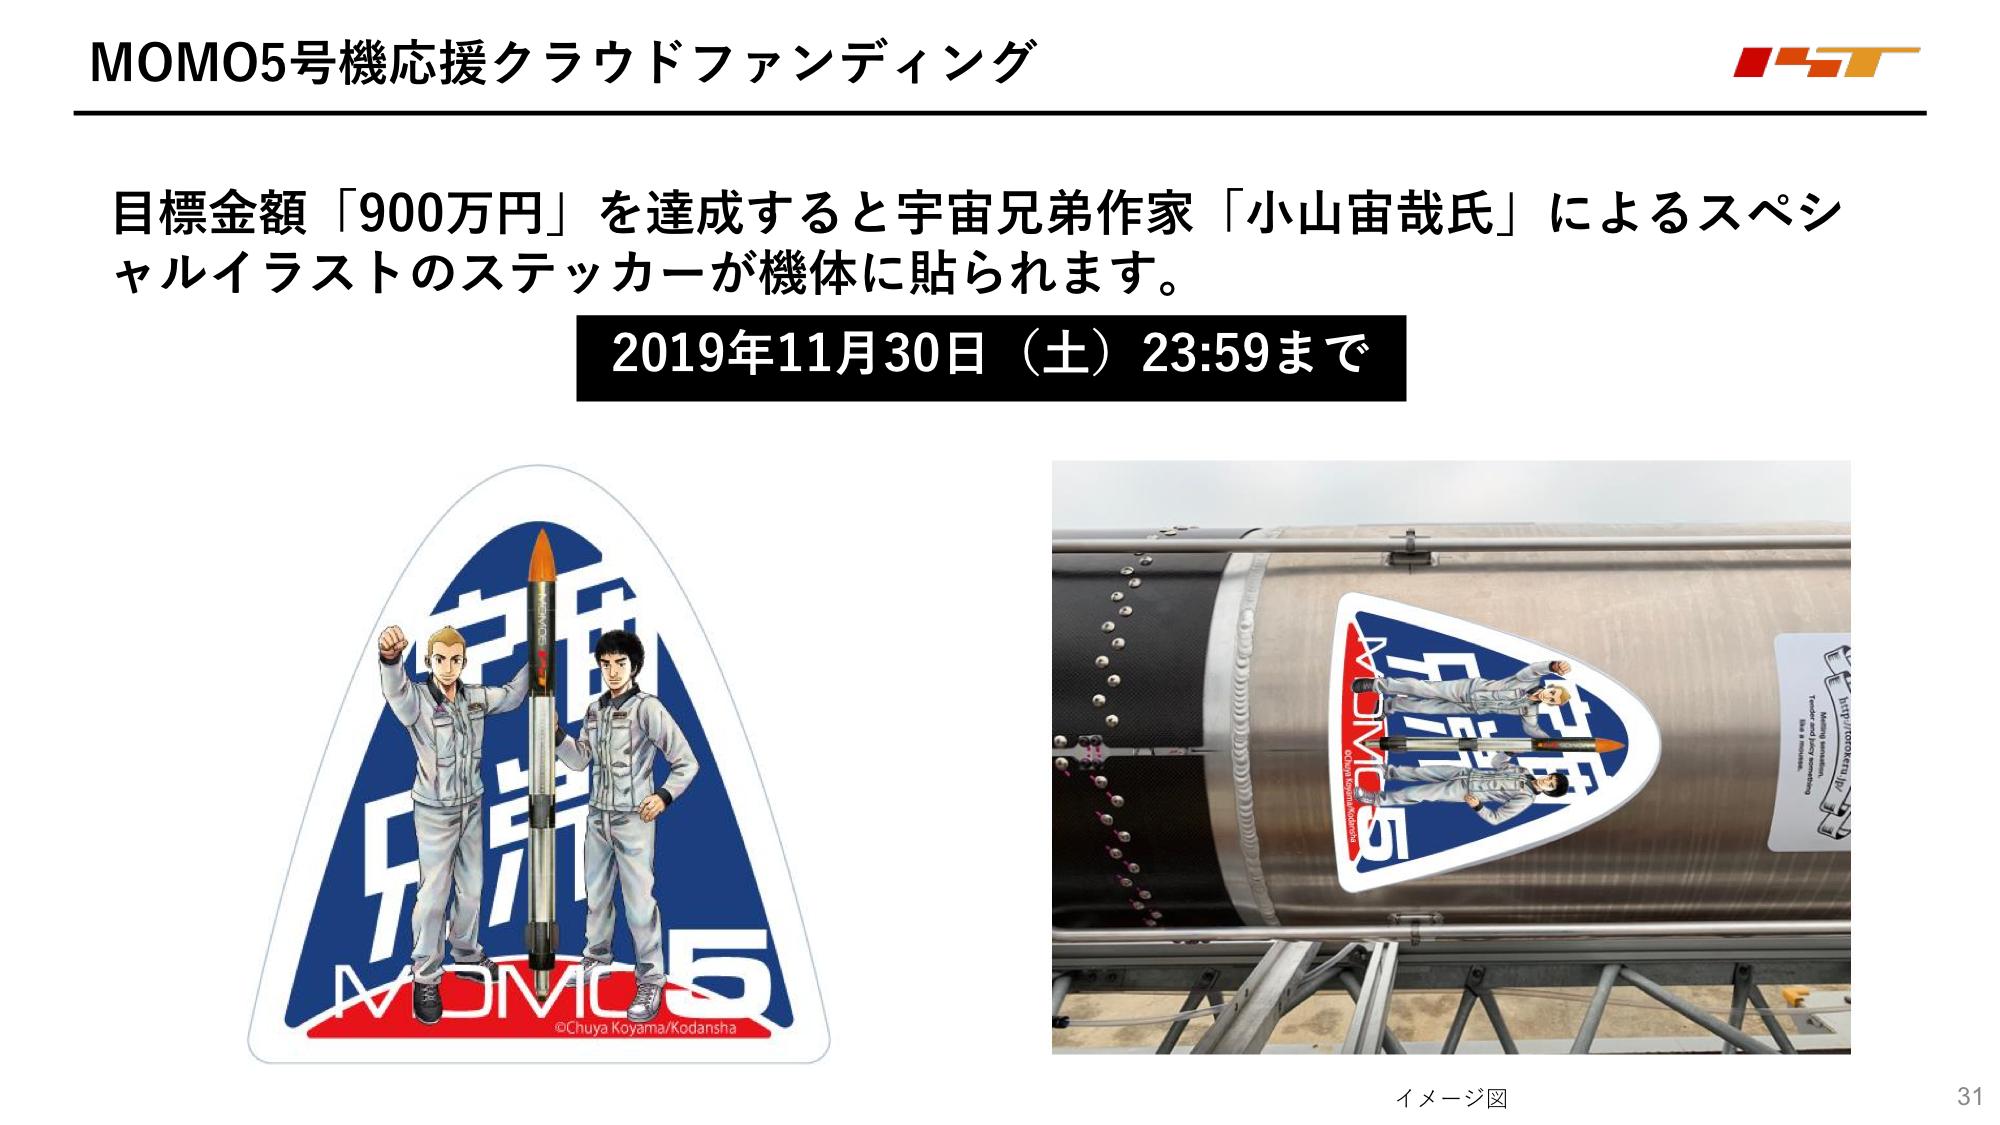 f:id:Imamura:20191126135316p:plain